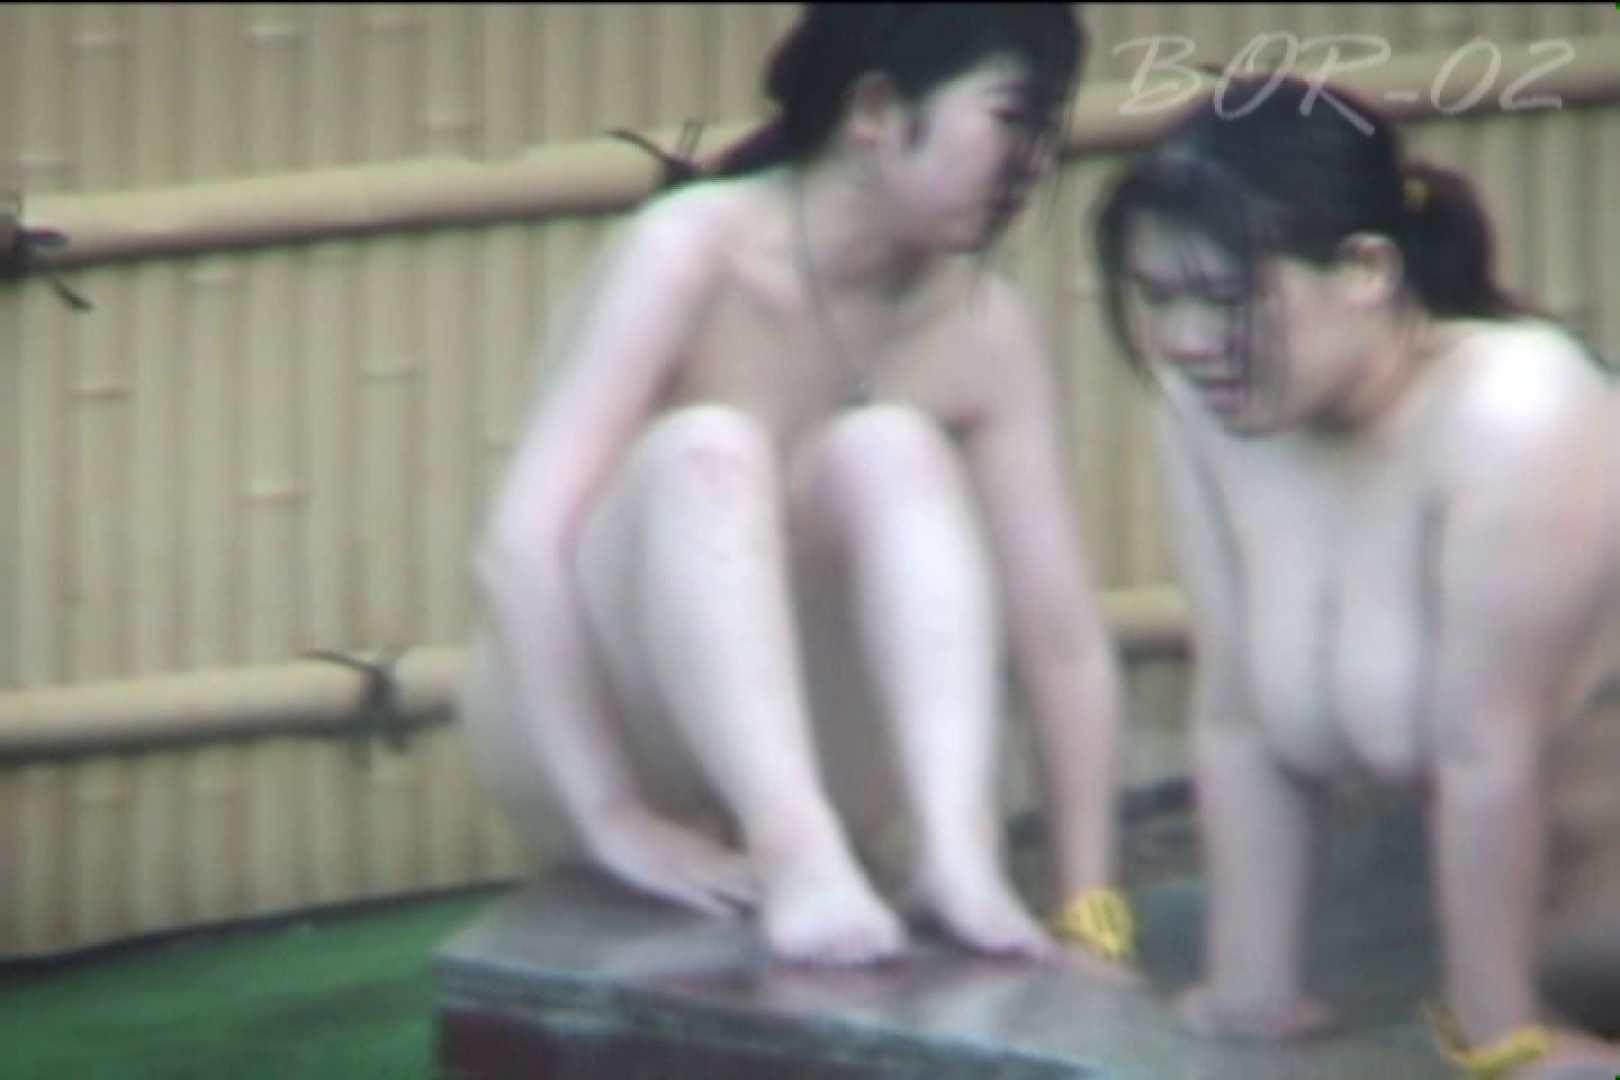 Aquaな露天風呂Vol.471 盗撮 | HなOL  66pic 24